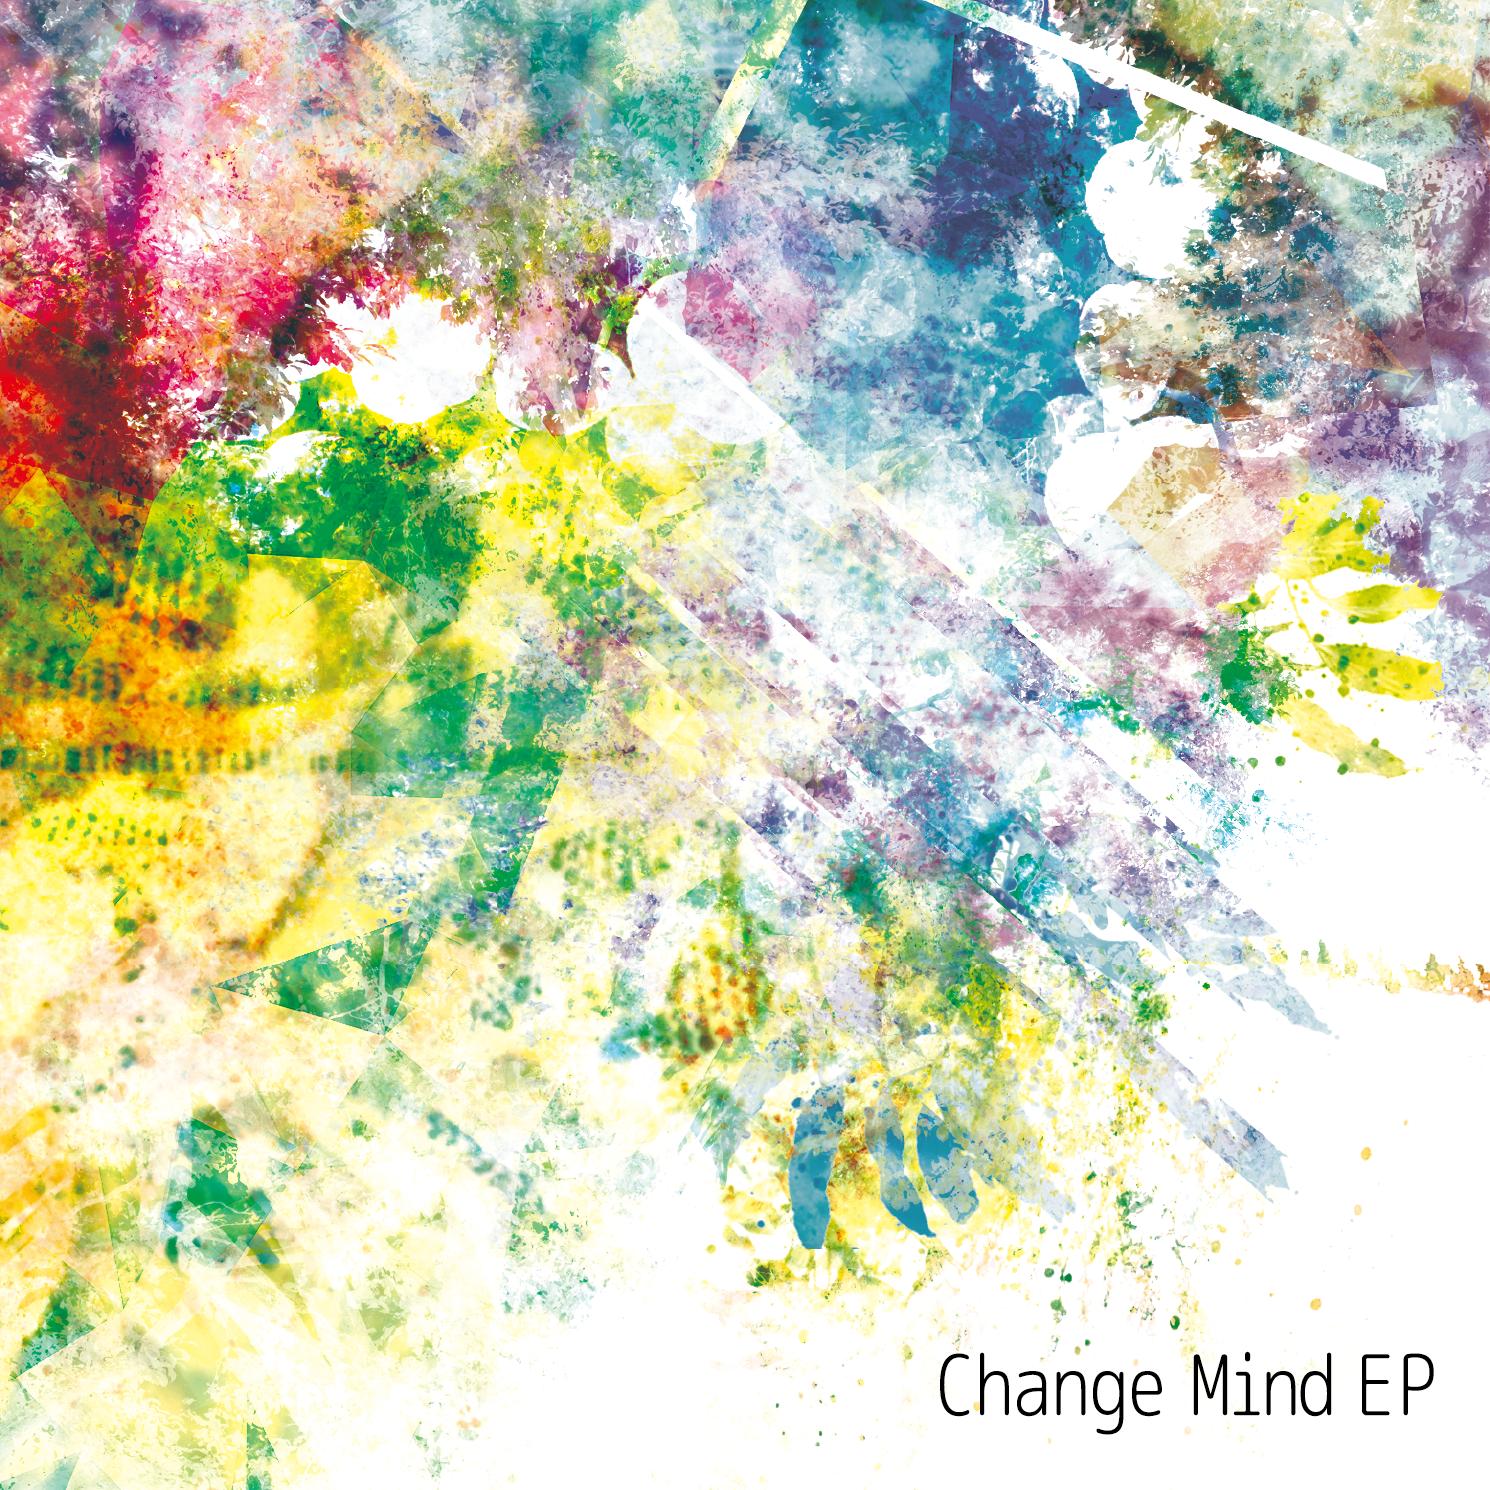 change mind ep fascinationbox booth 同人誌通販 ダウンロード